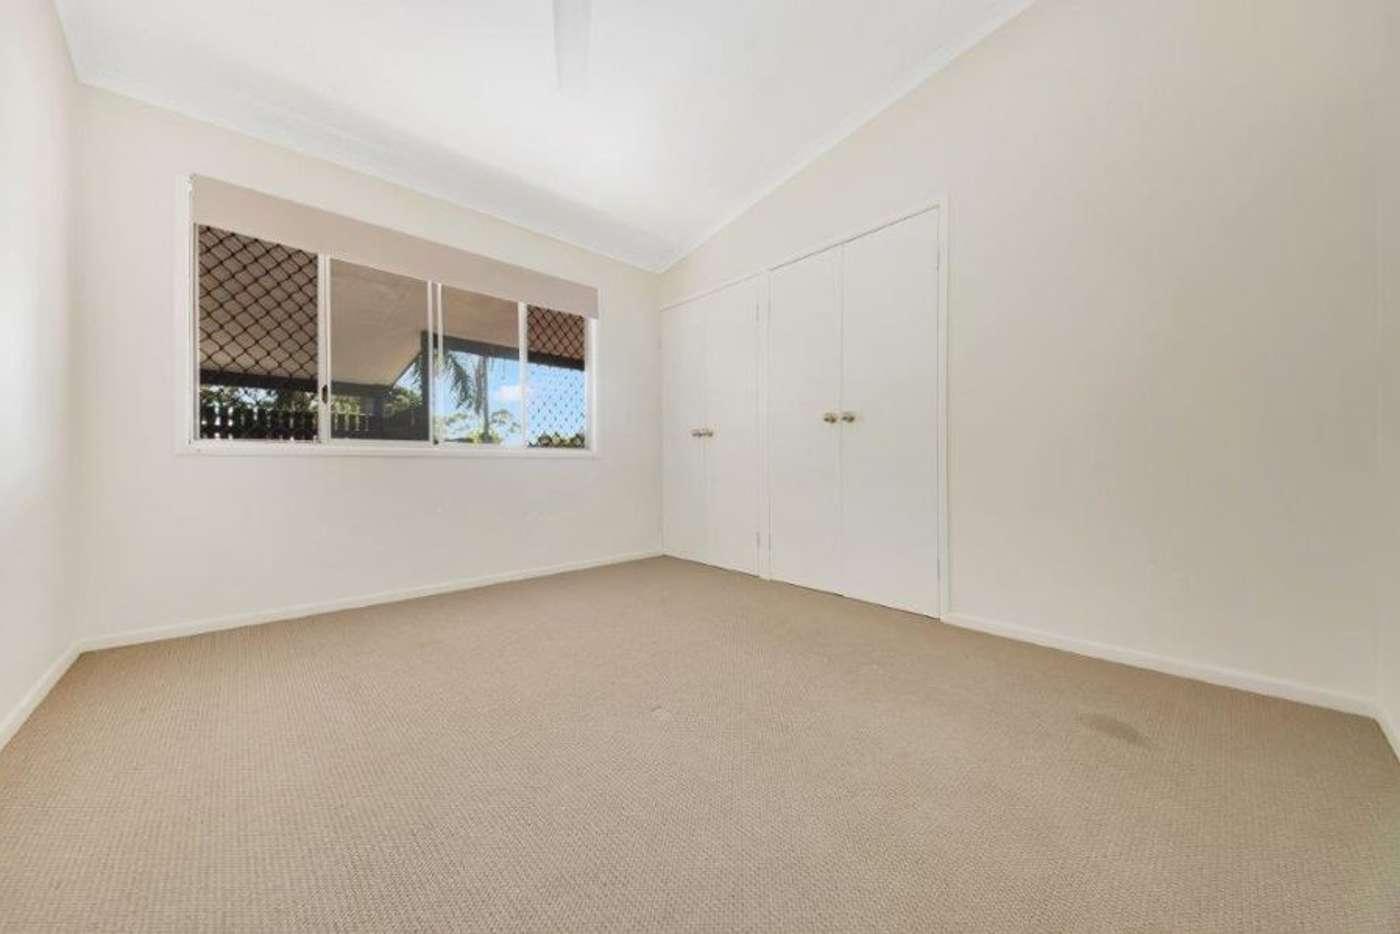 Seventh view of Homely house listing, 15 Tasman Court, Boyne Island QLD 4680